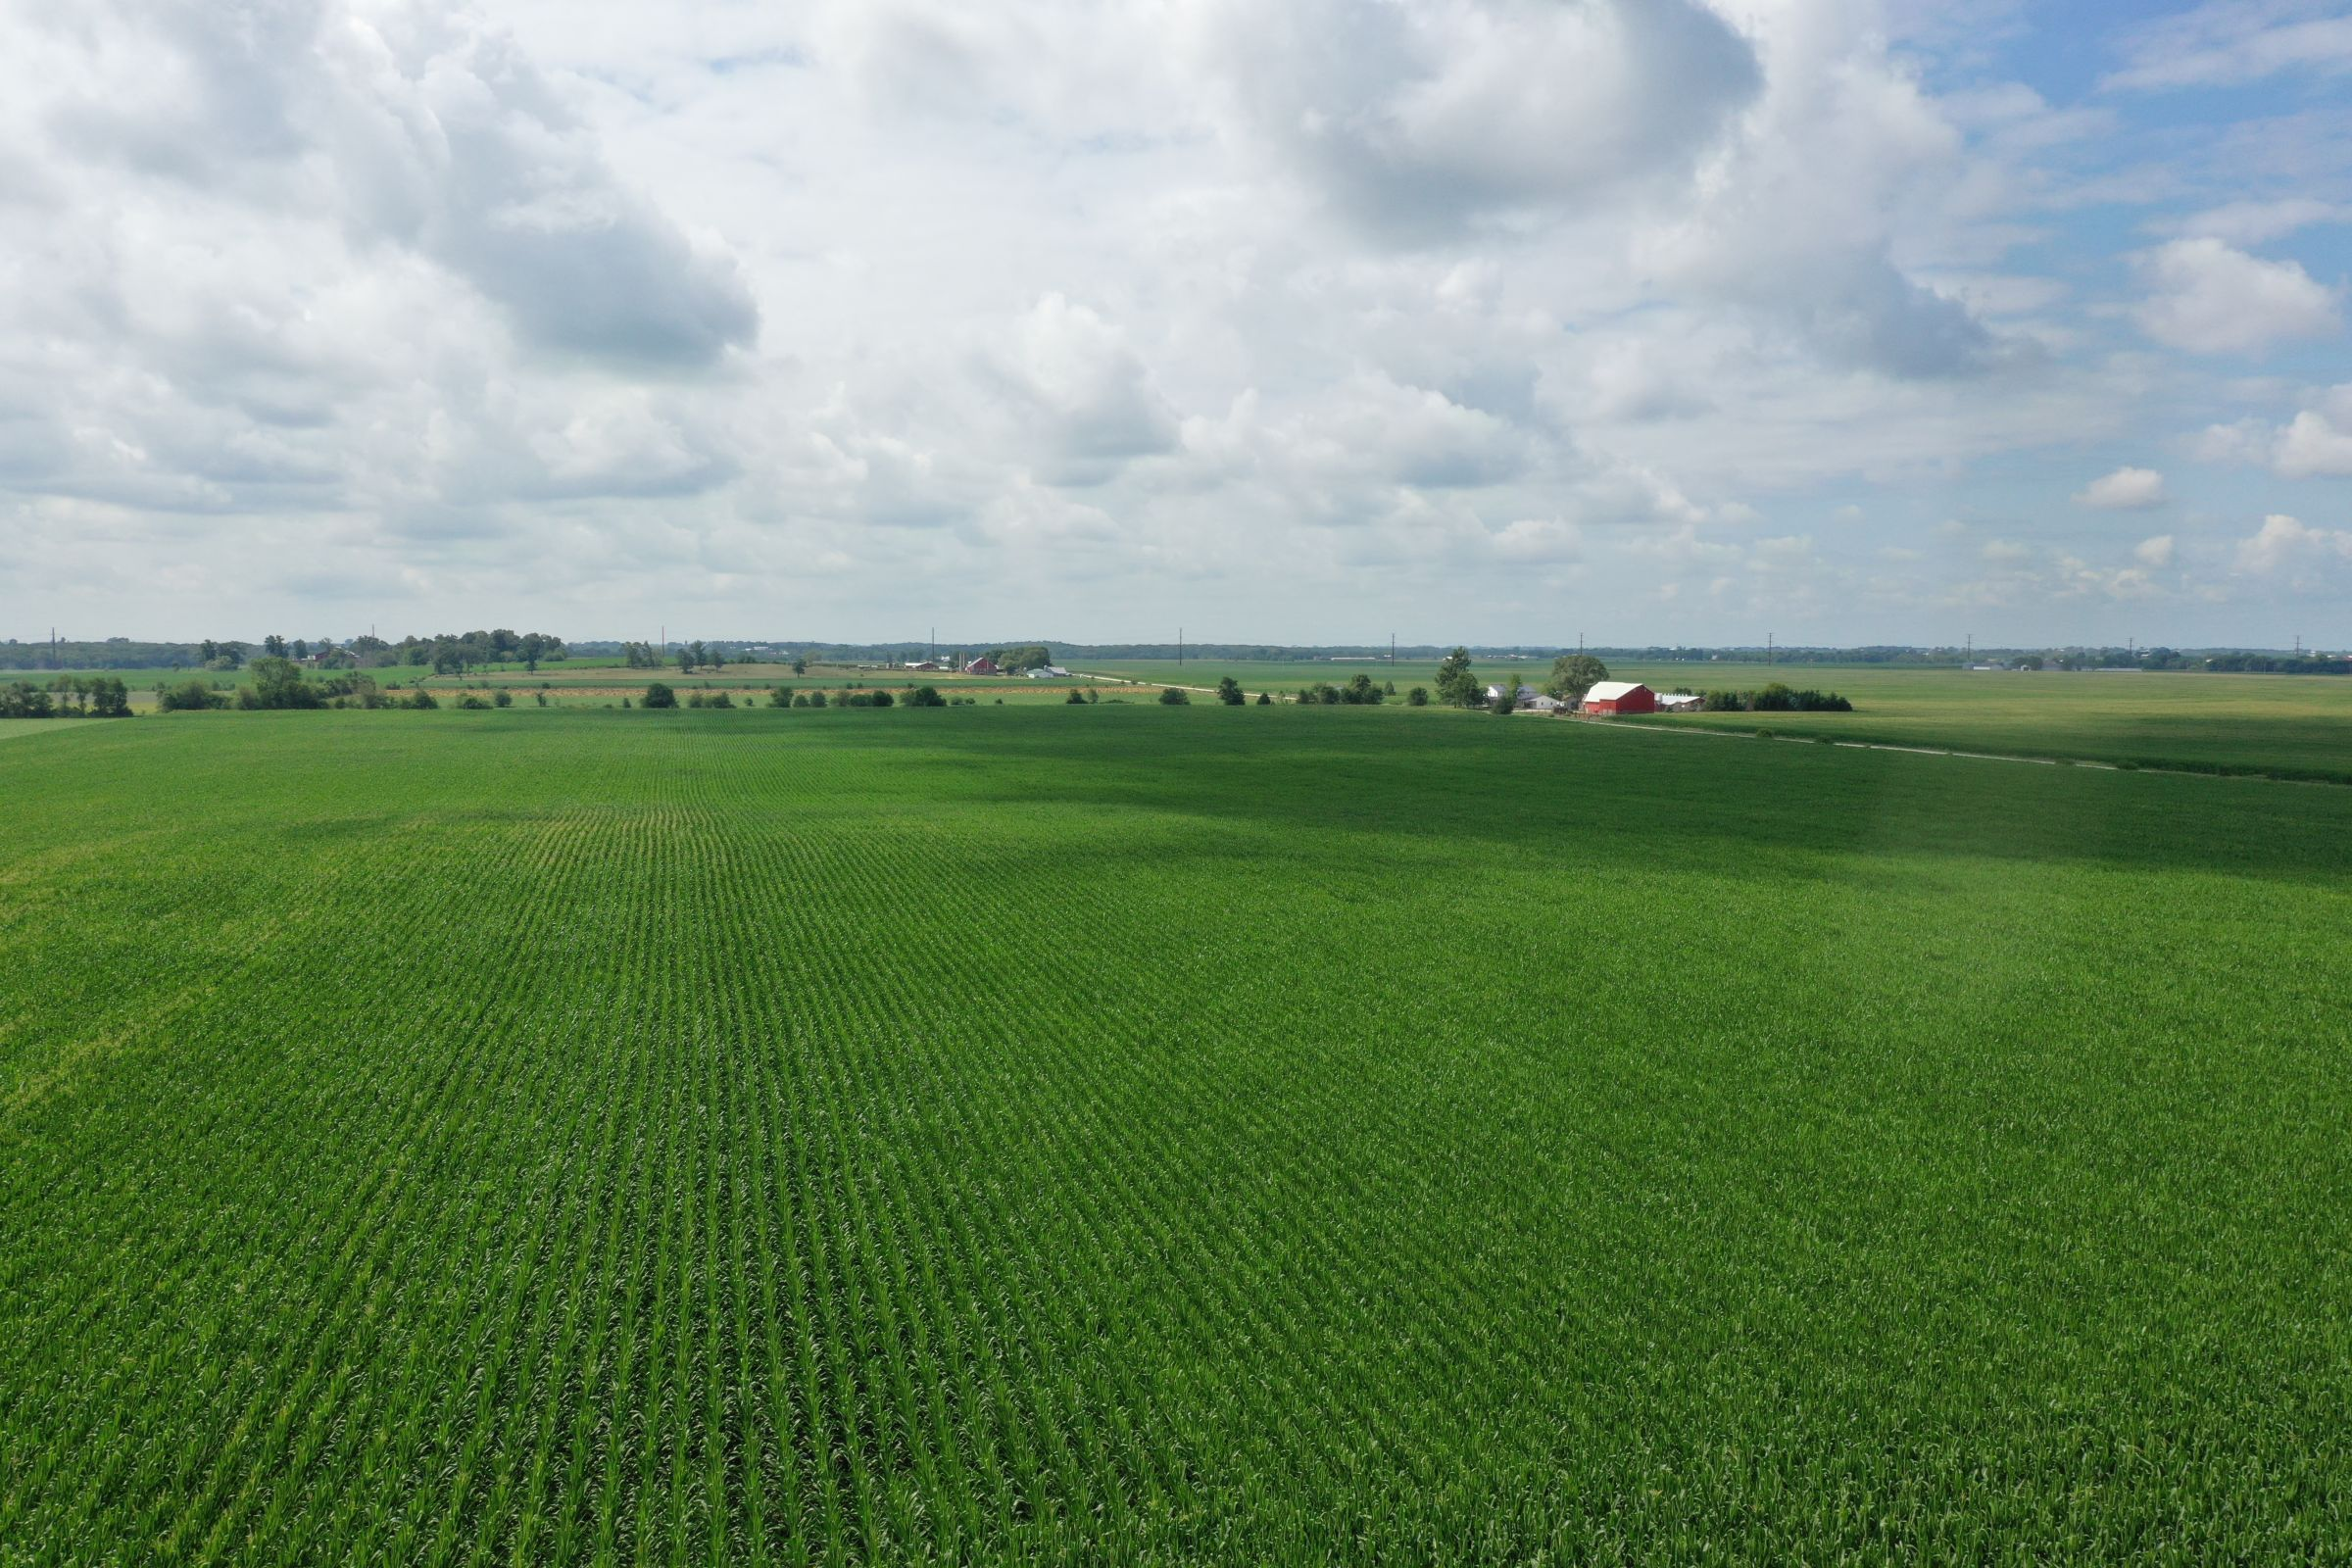 land-buchanan-county-iowa-60-acres-listing-number-15640-0-2021-07-15-183927.JPG